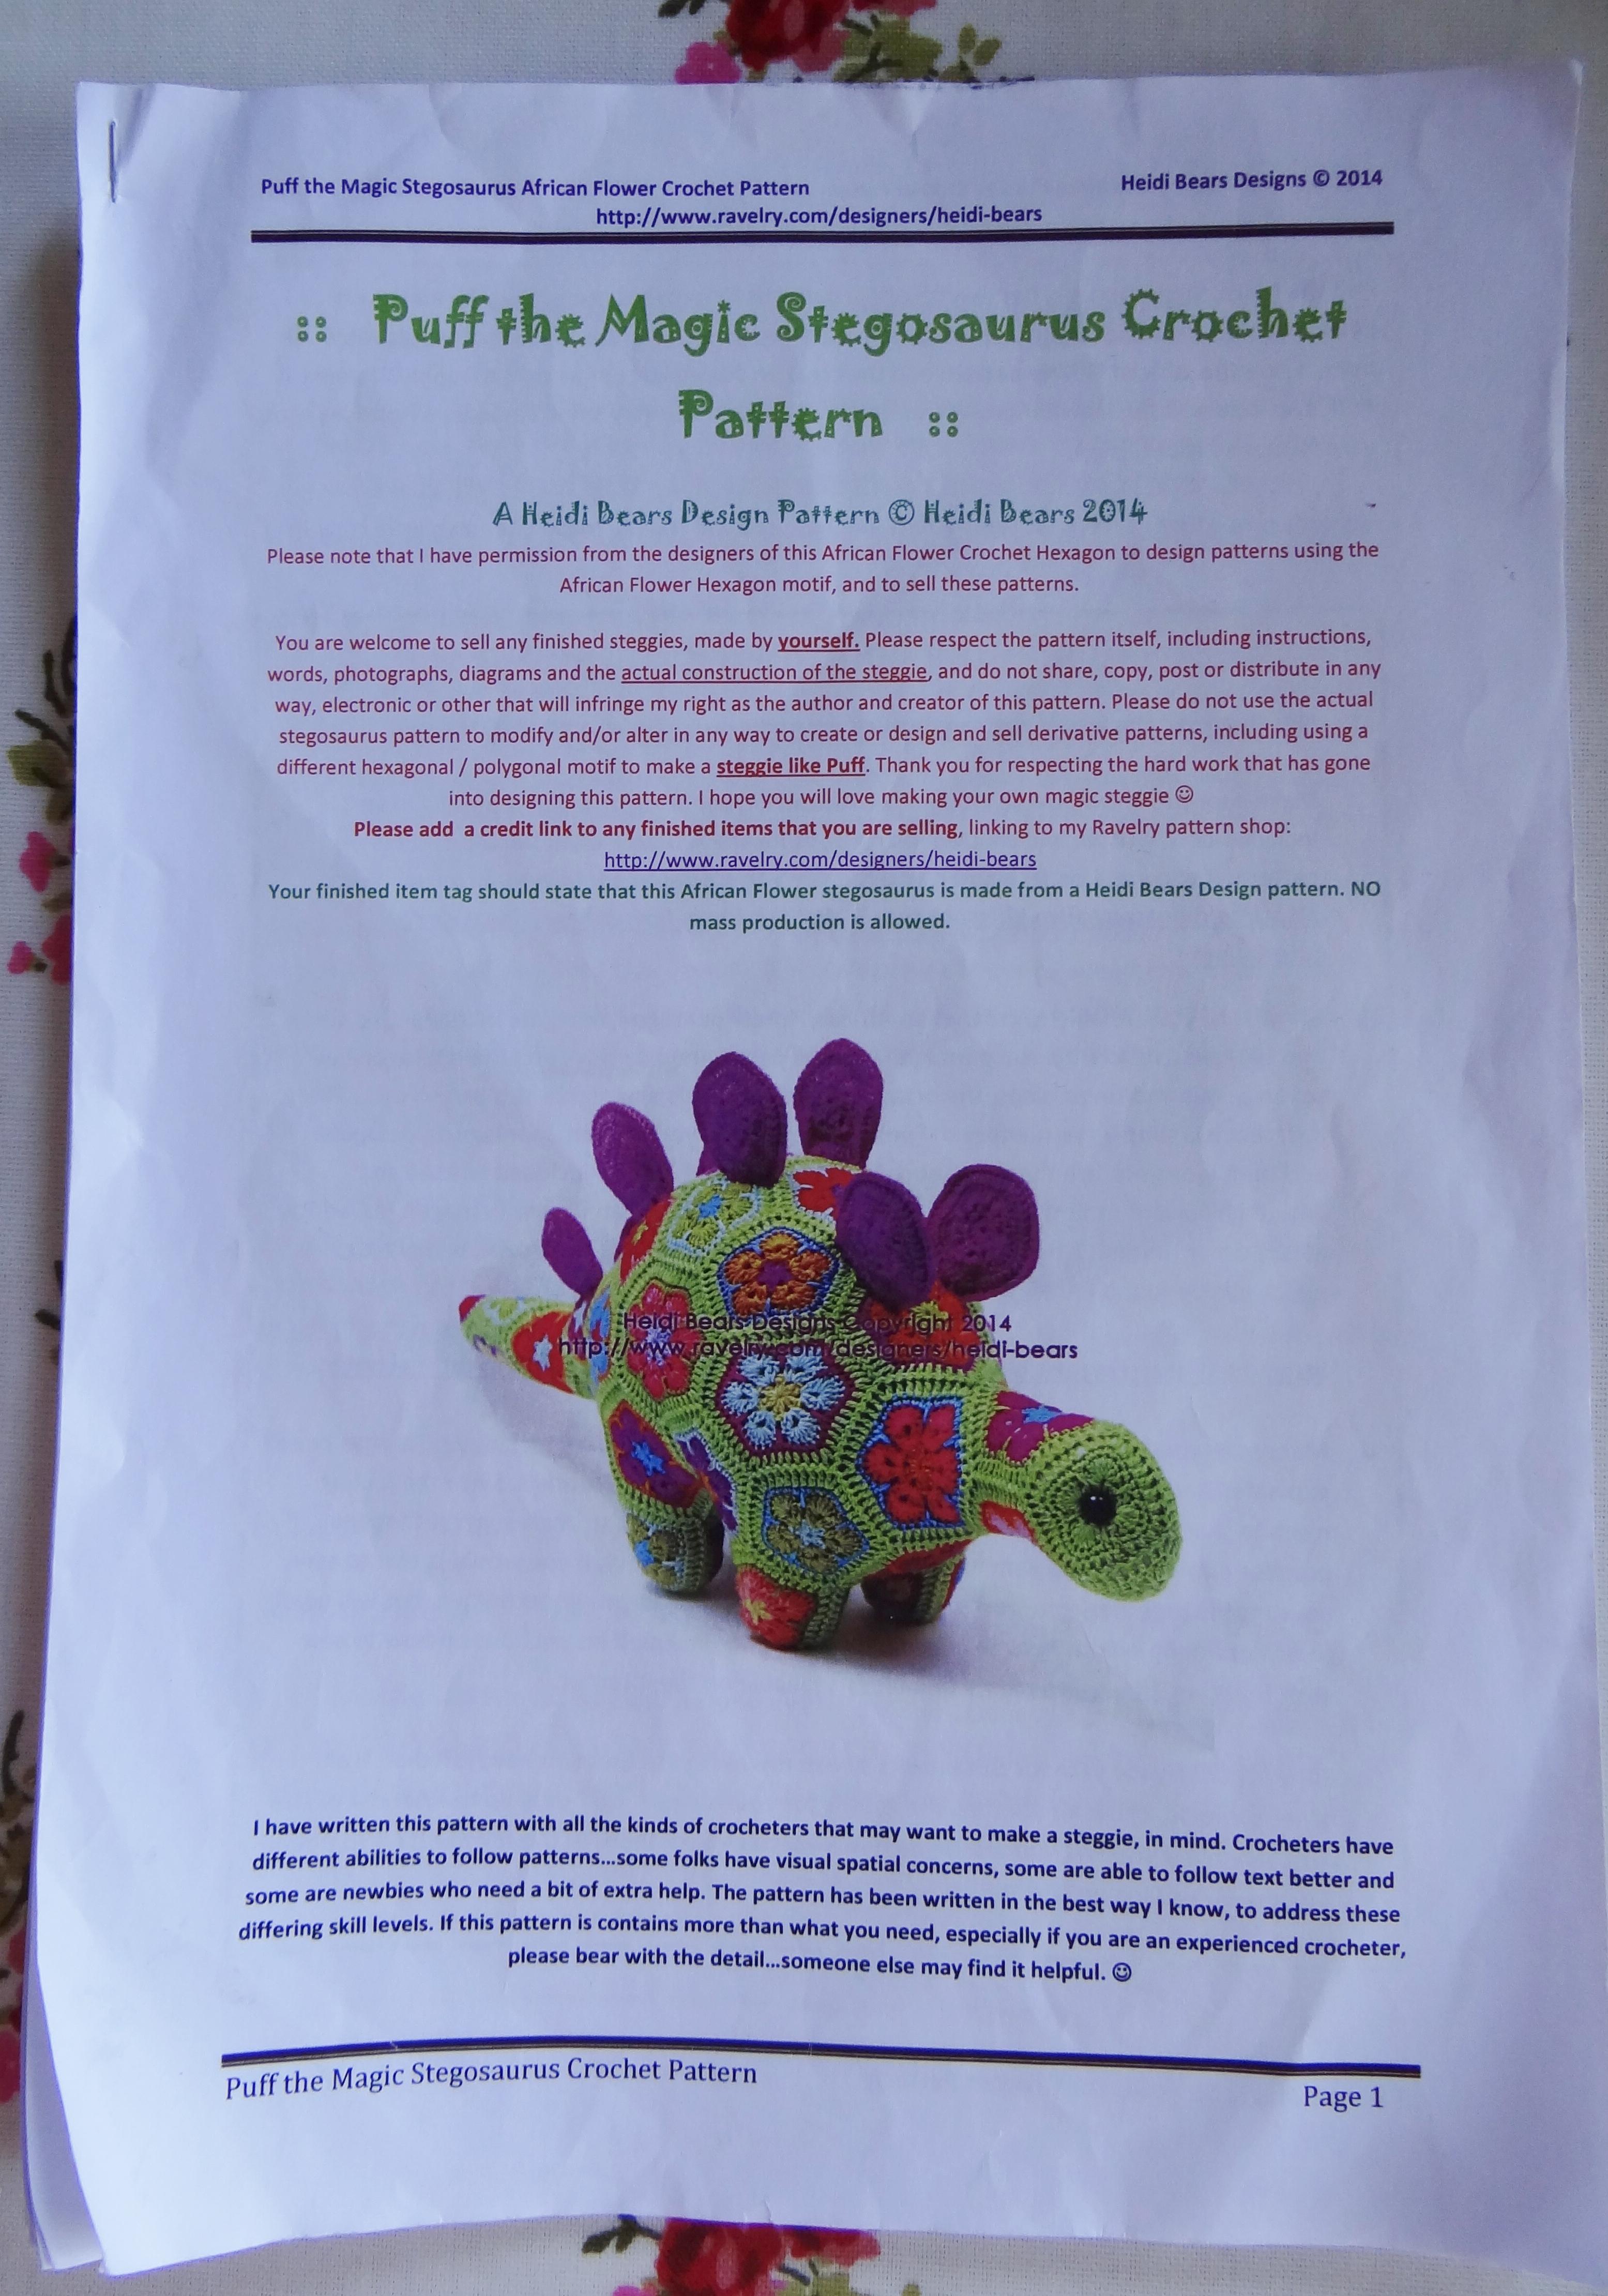 The Making of Magic – Heidi Bears Puff the Magic Stegosaurus Crochet ...